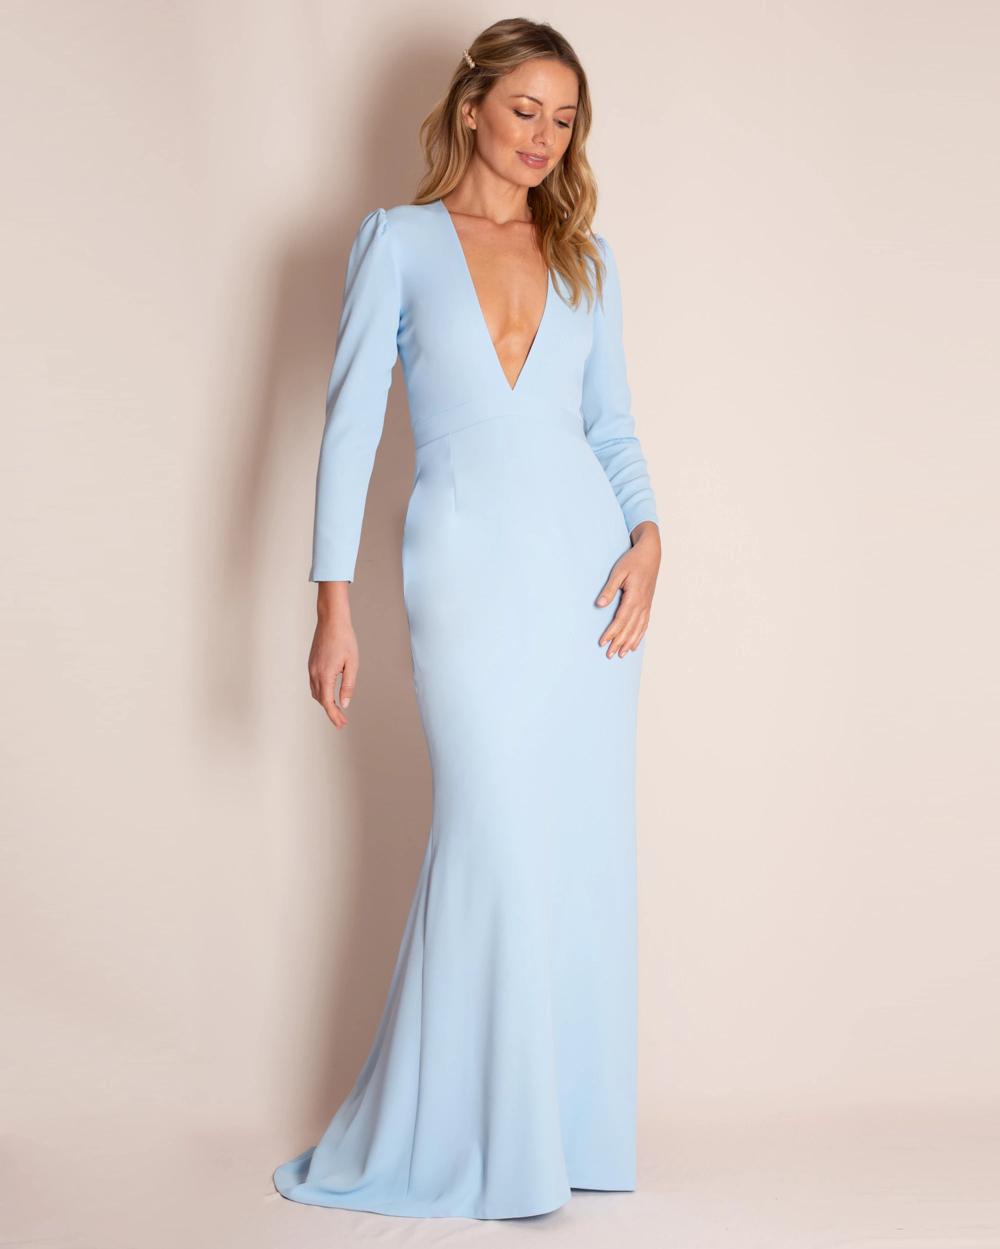 The Valerie Gown Silk Prom Dress Long Sleeve Dress Formal Long Blue Dress [ 1249 x 1000 Pixel ]